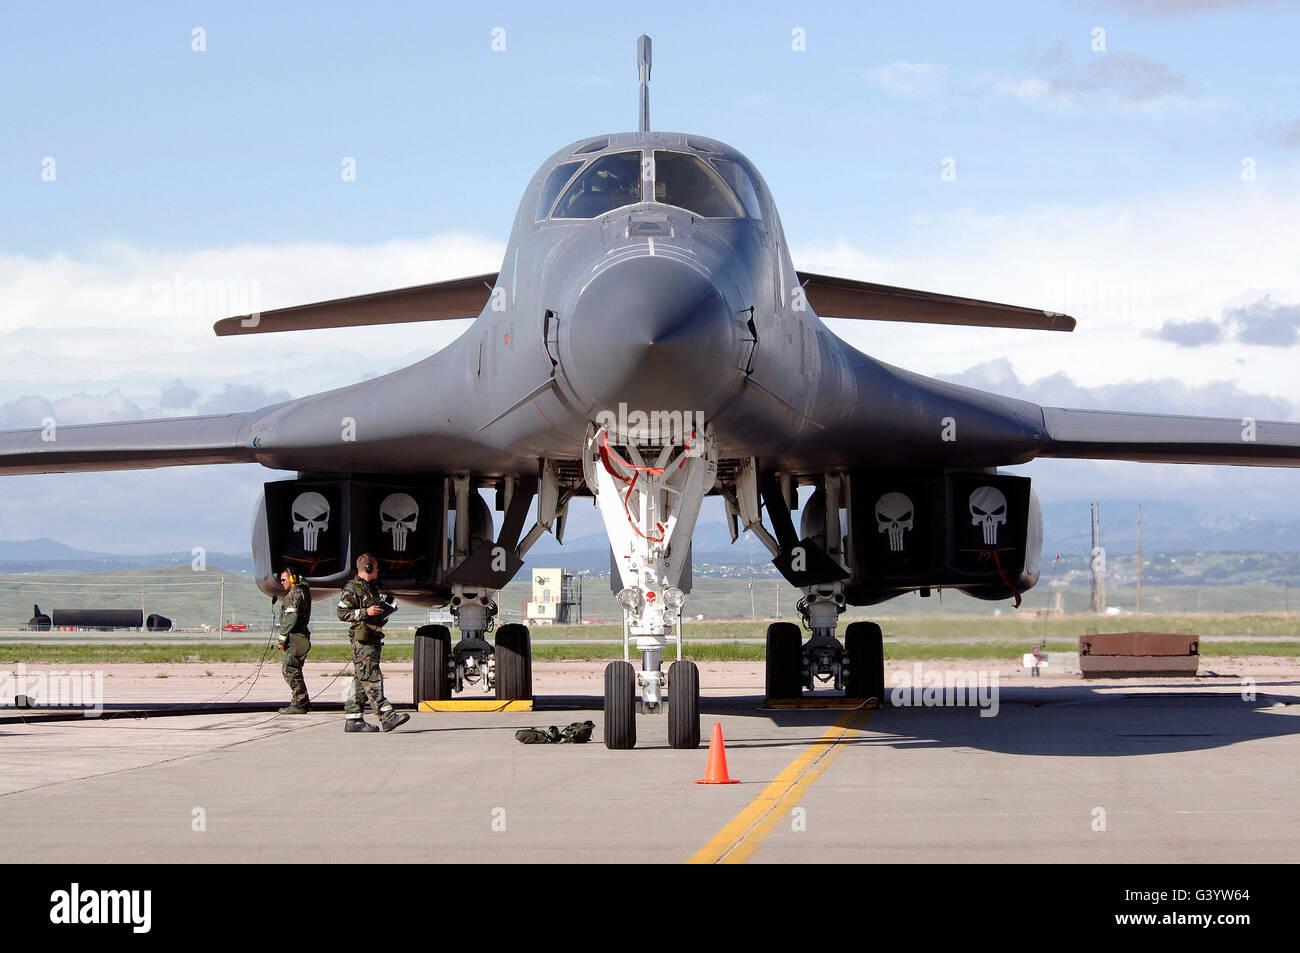 A B-1 Lancer awaits a pre-flight inspection. - Stock Image